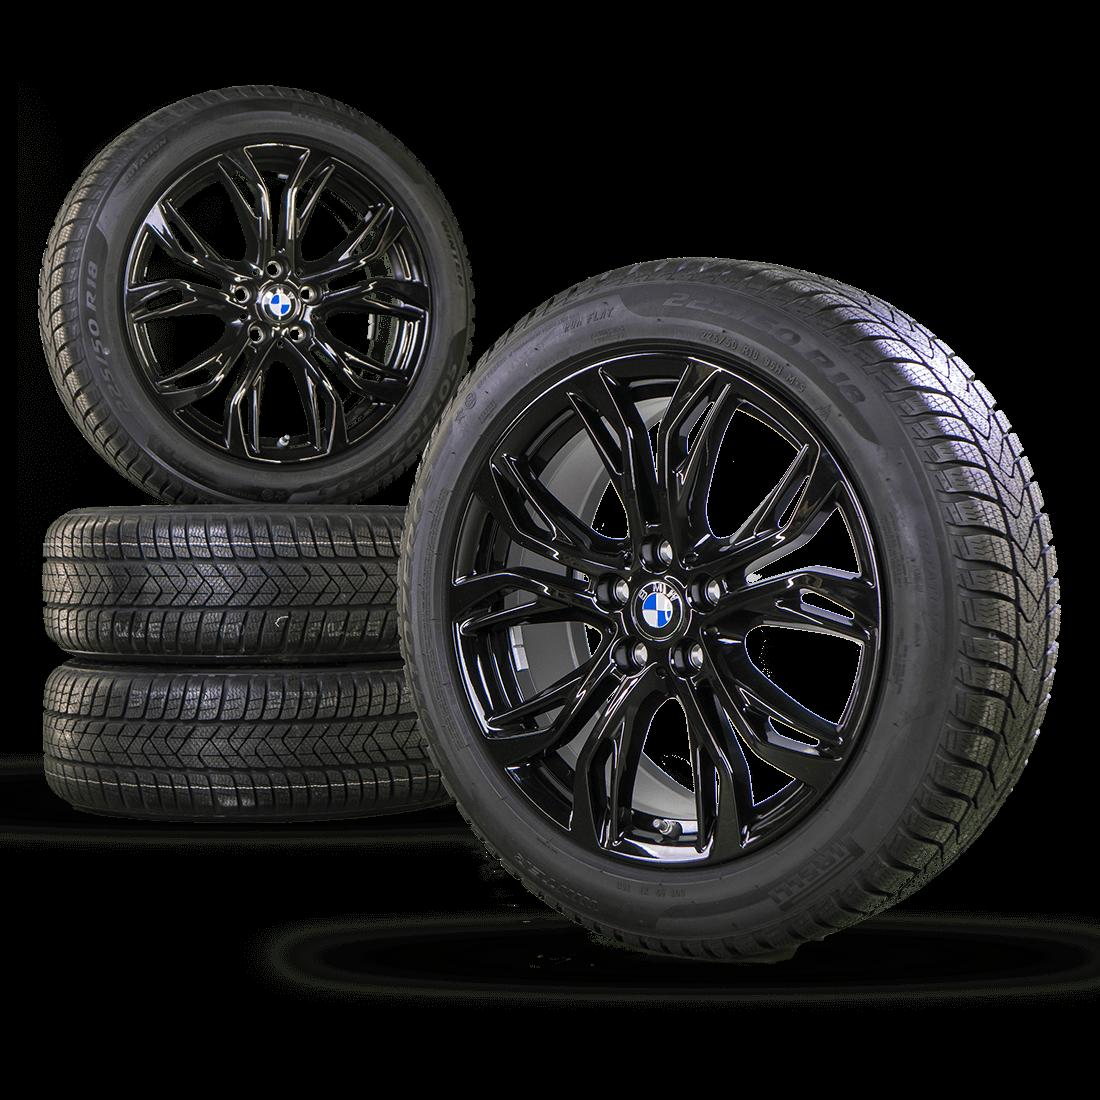 bmw 18 inch x1 f48 f49 x2 f39 winter wheels rims winter tires. Black Bedroom Furniture Sets. Home Design Ideas